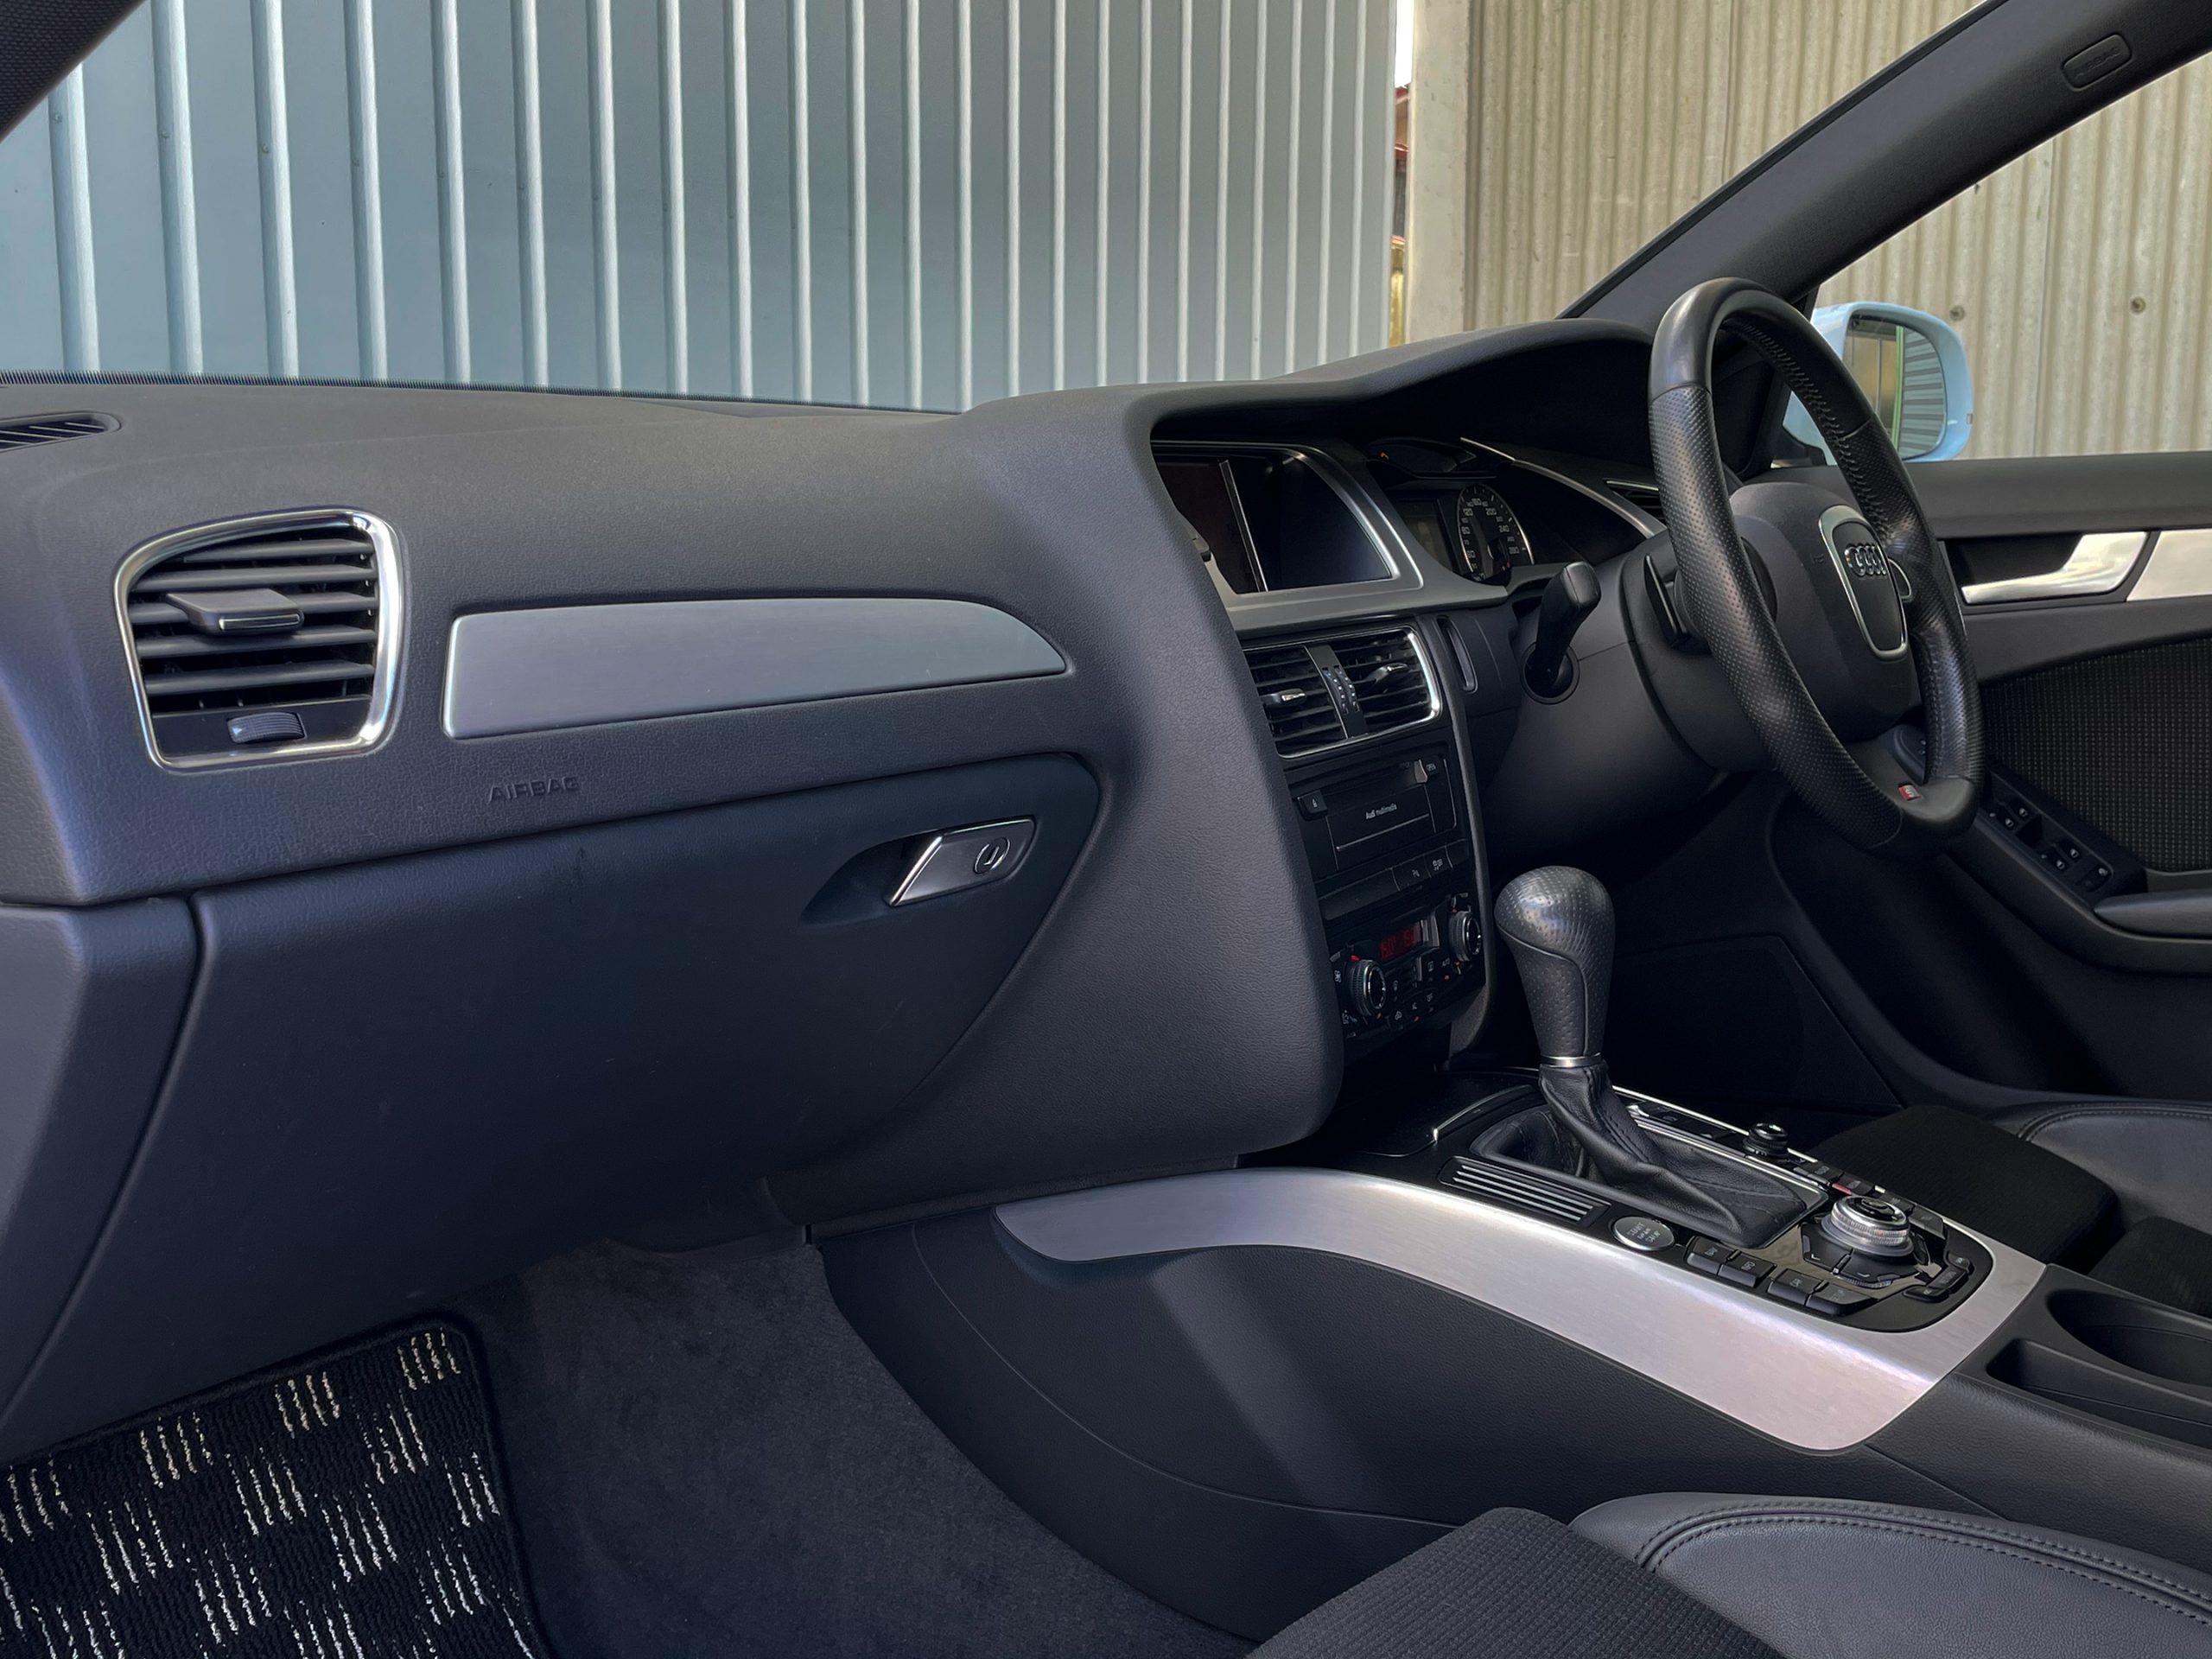 Audi A4 Avant 2.0TFSI S-line package